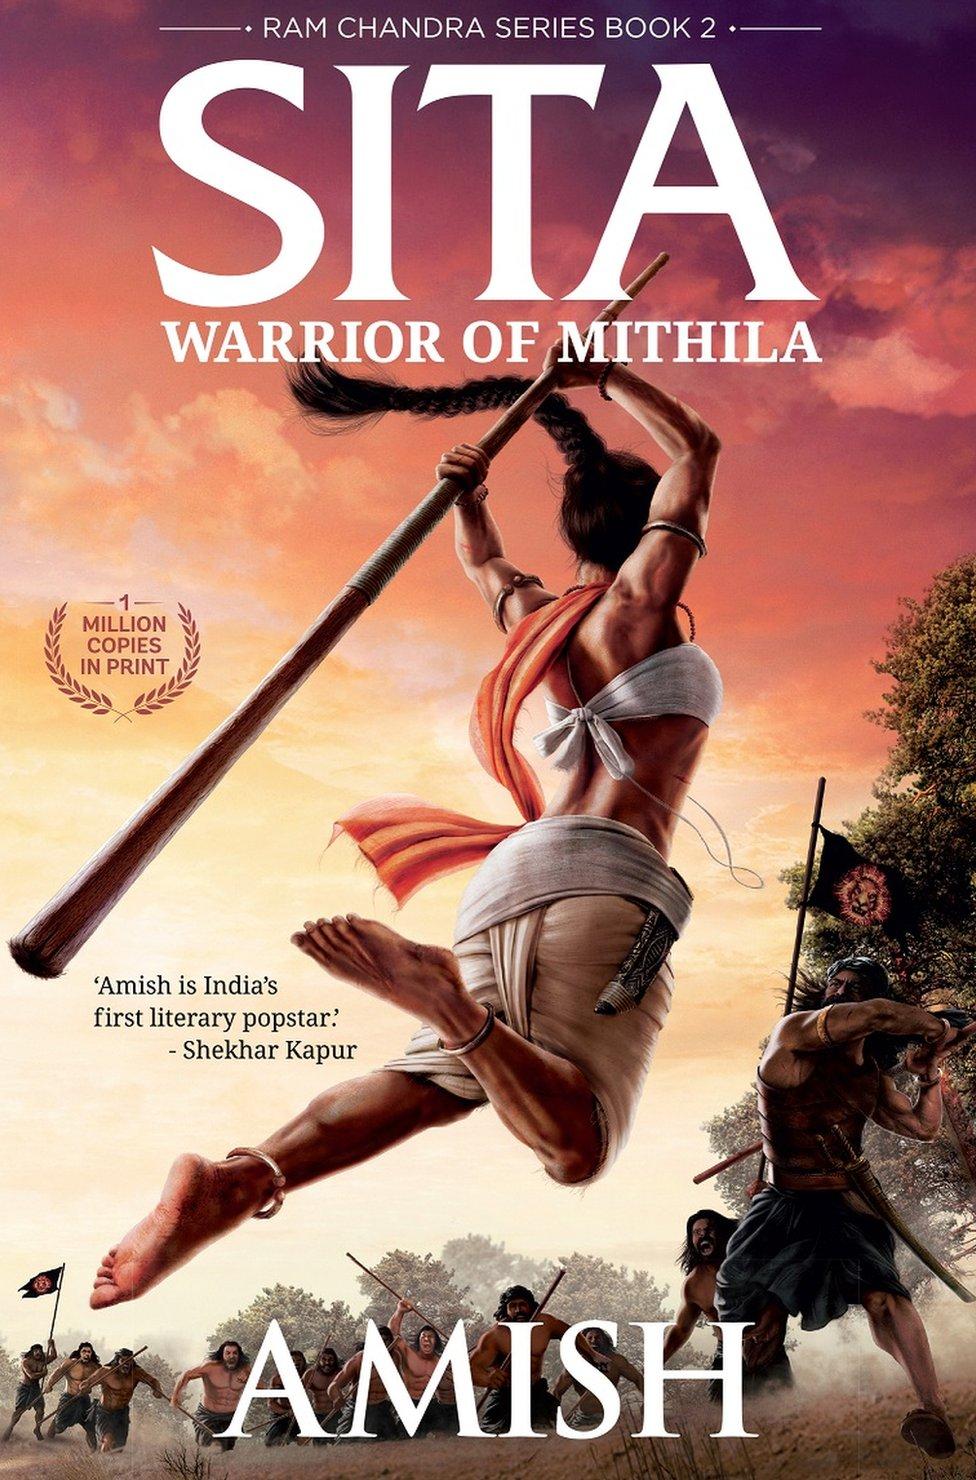 Cover of Sita, Tripathi's latest book